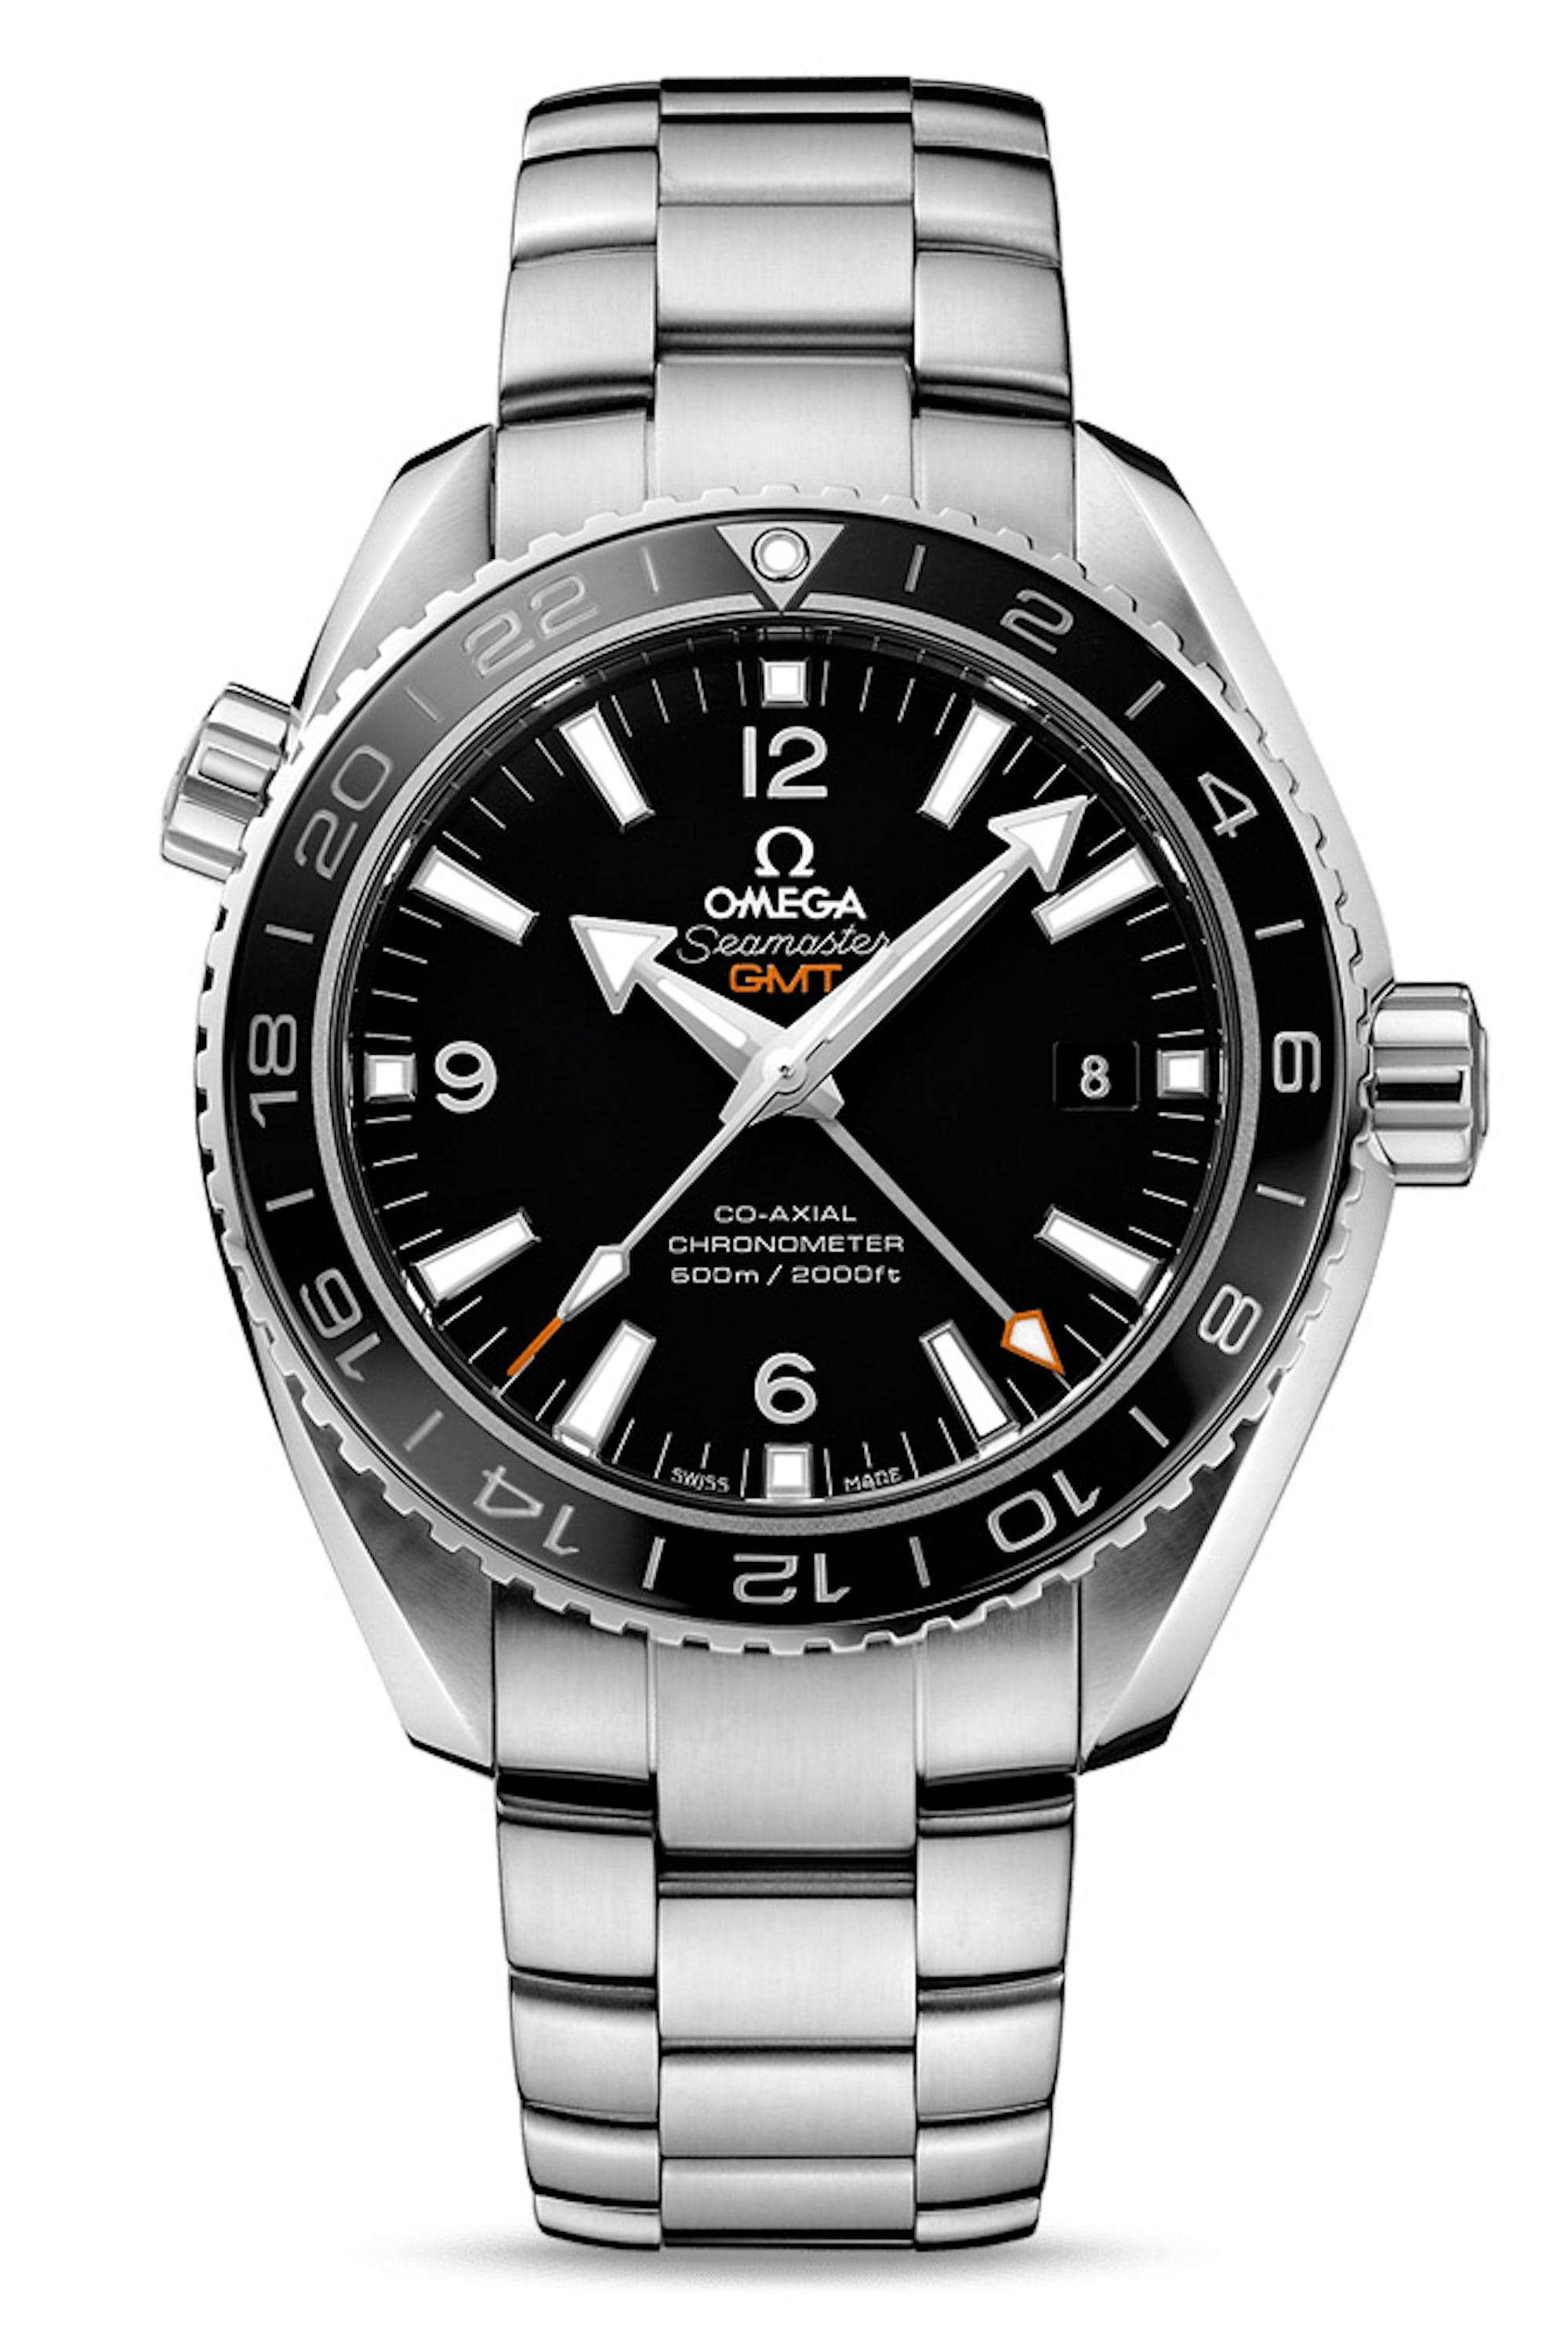 A Week On The Wrist: The Tudor Black Bay GMT Omega GMT